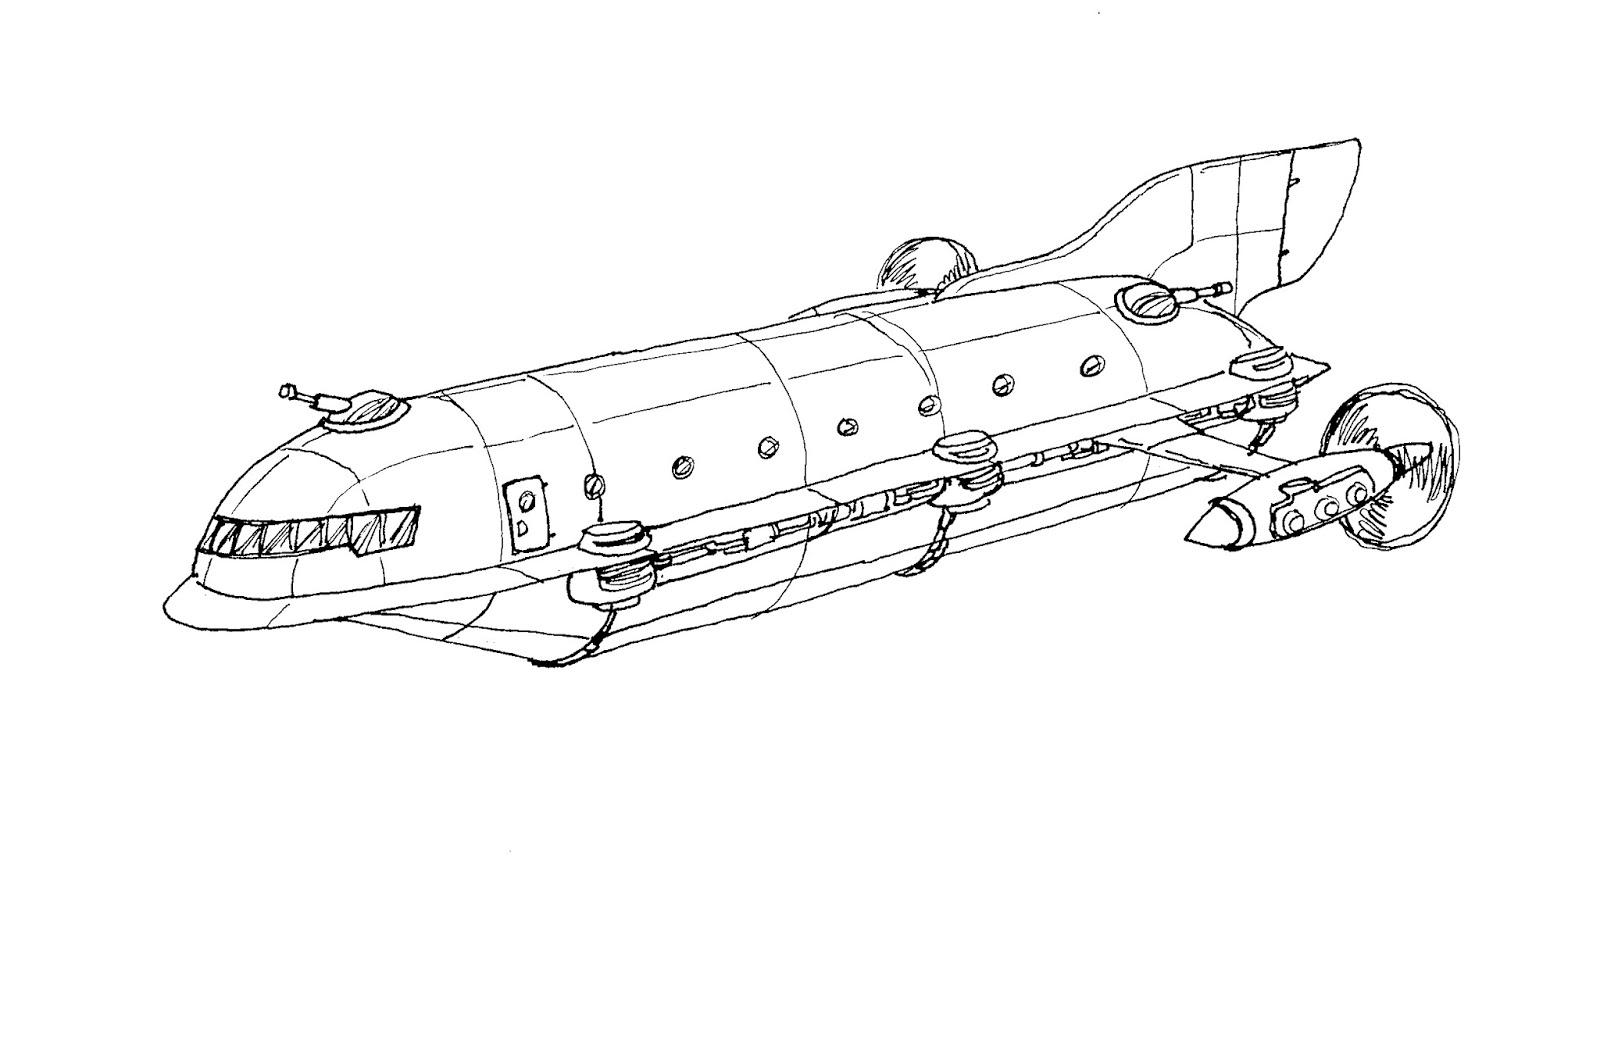 Swords Of Cydoria More New Aero Ship Zephyr Designs